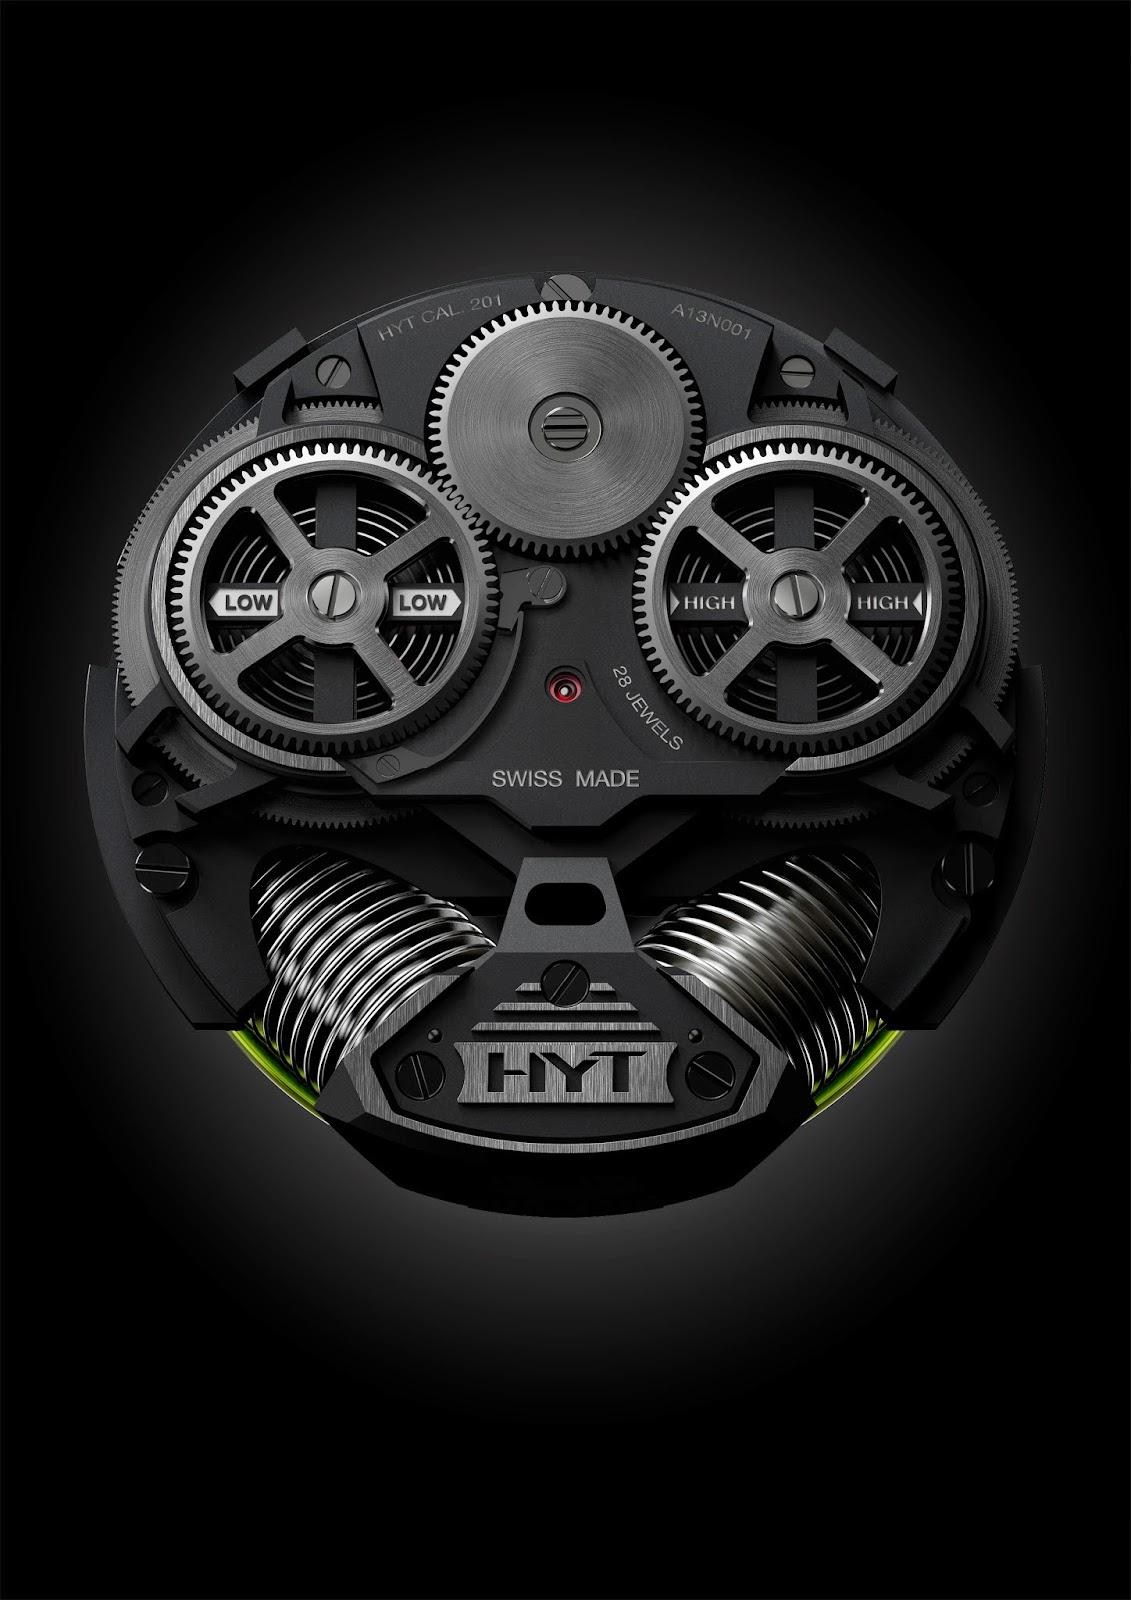 HYT watch6